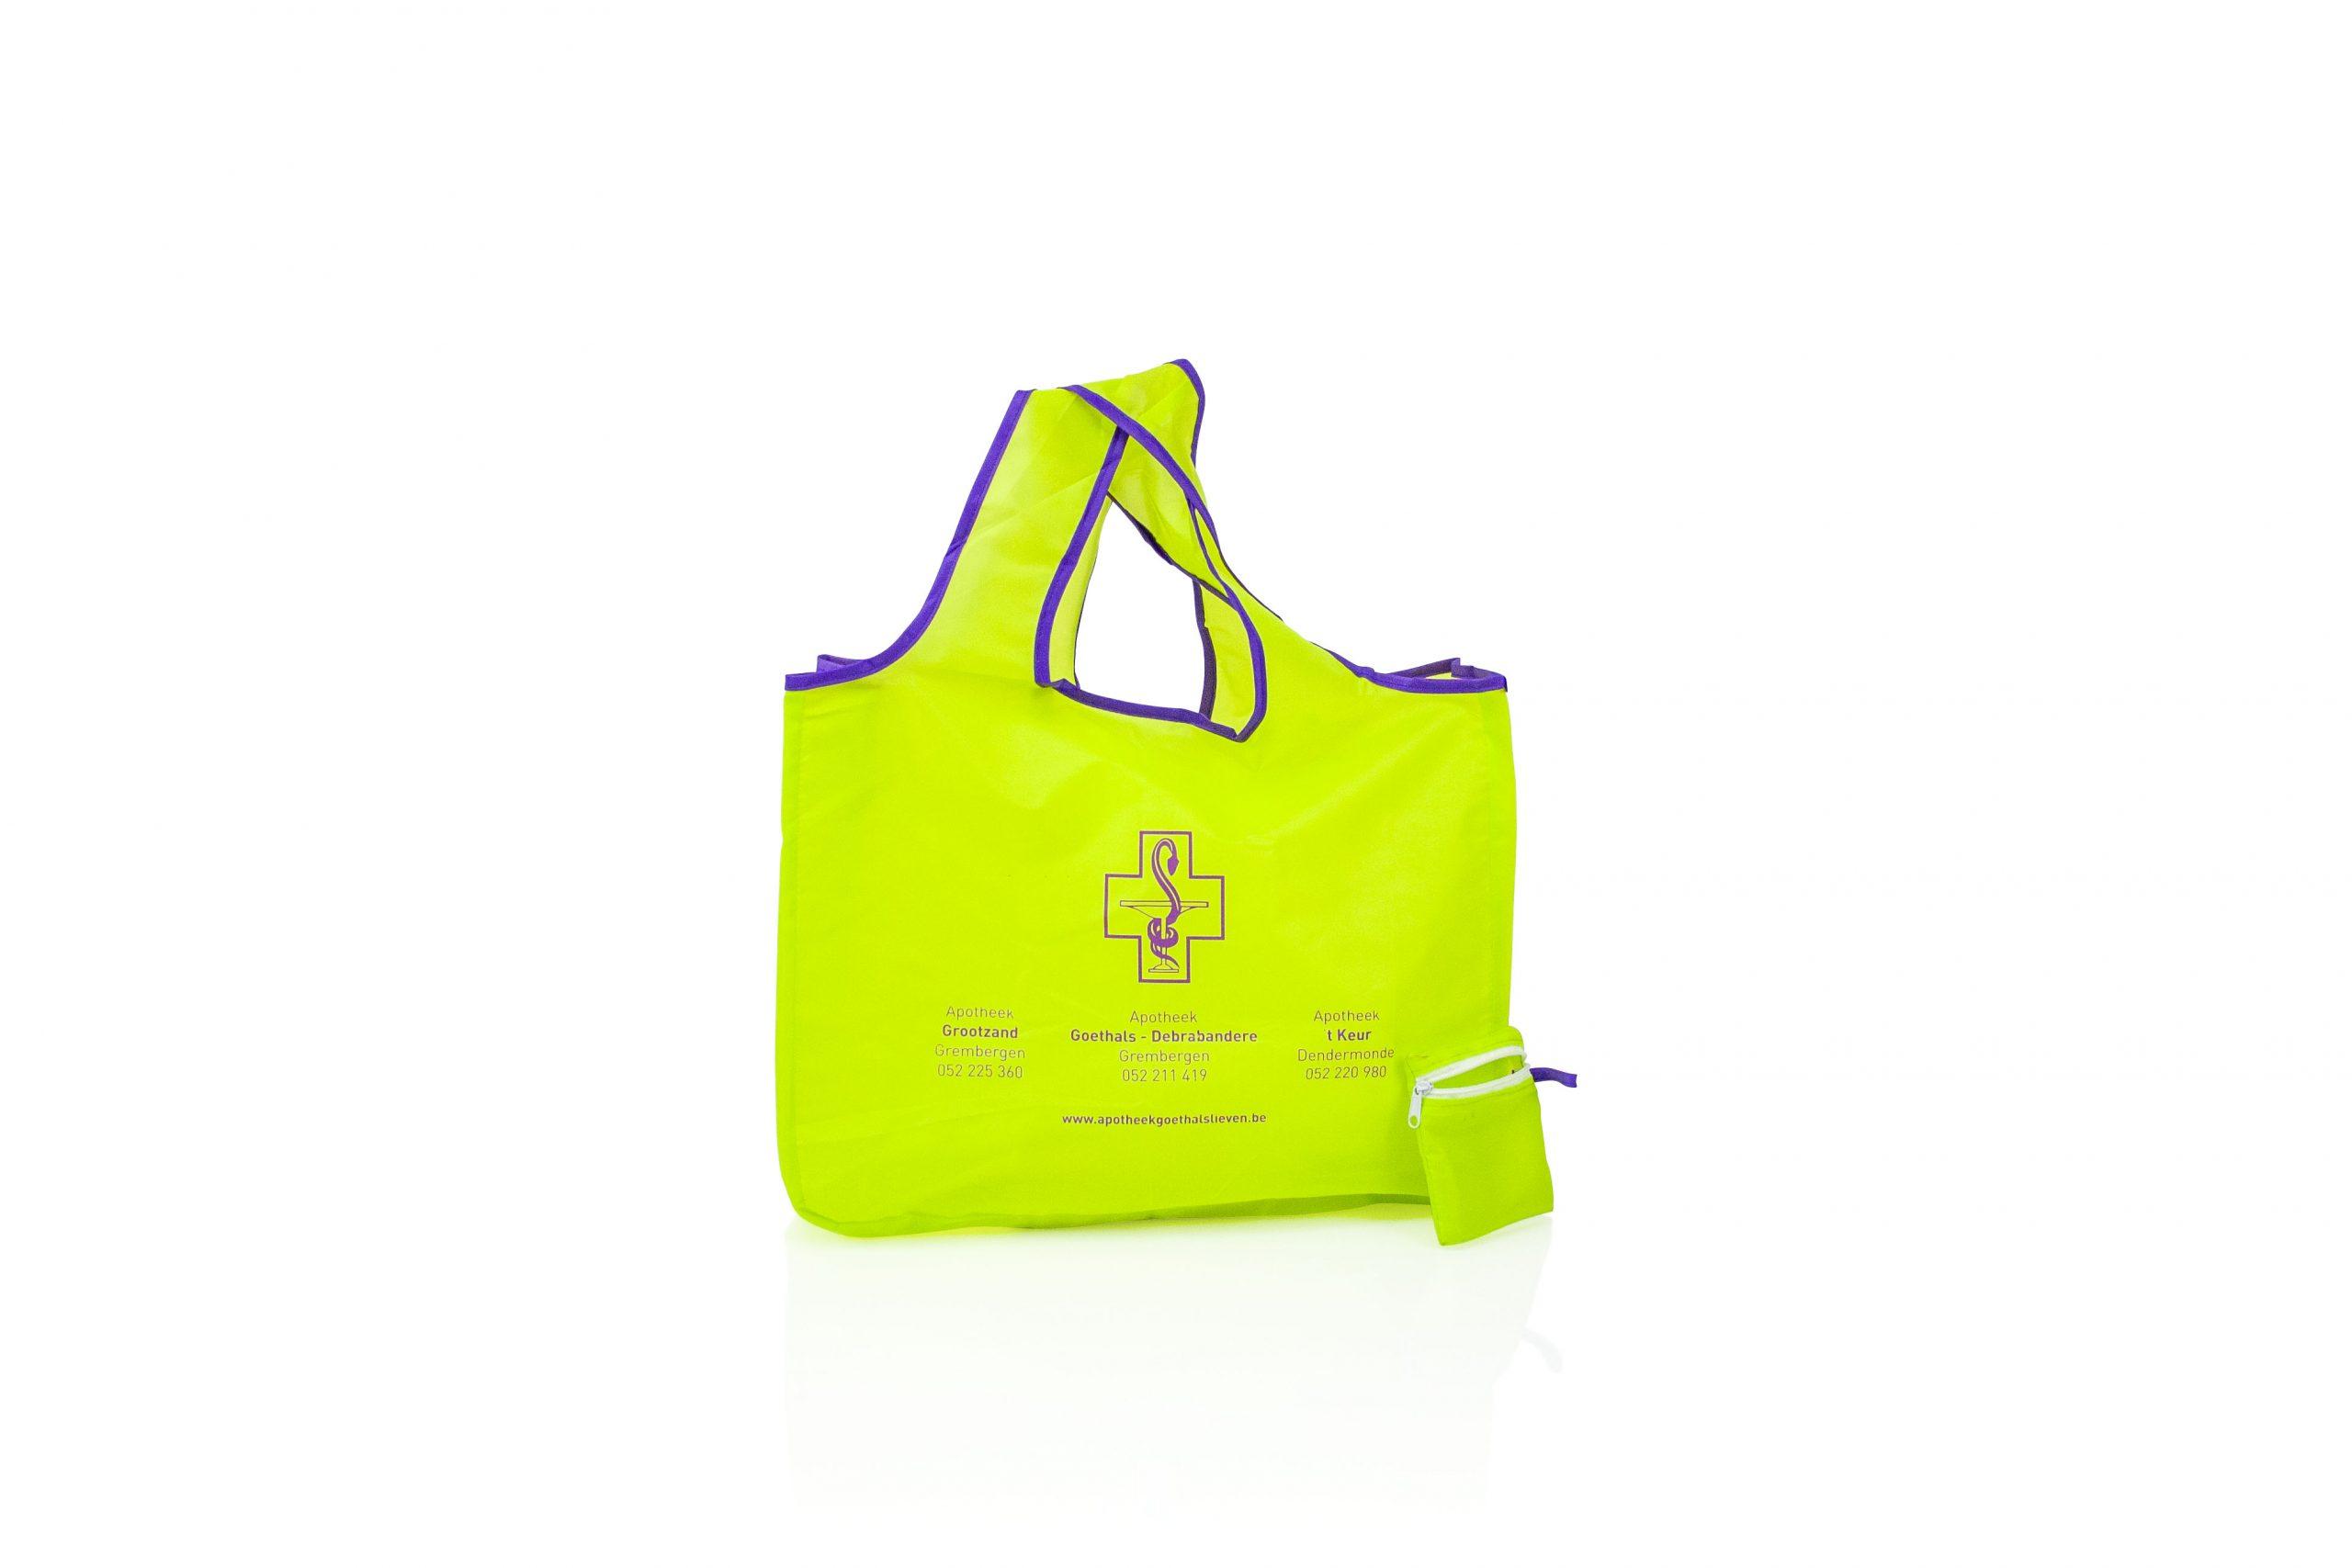 Foldable bag apotheek met logo